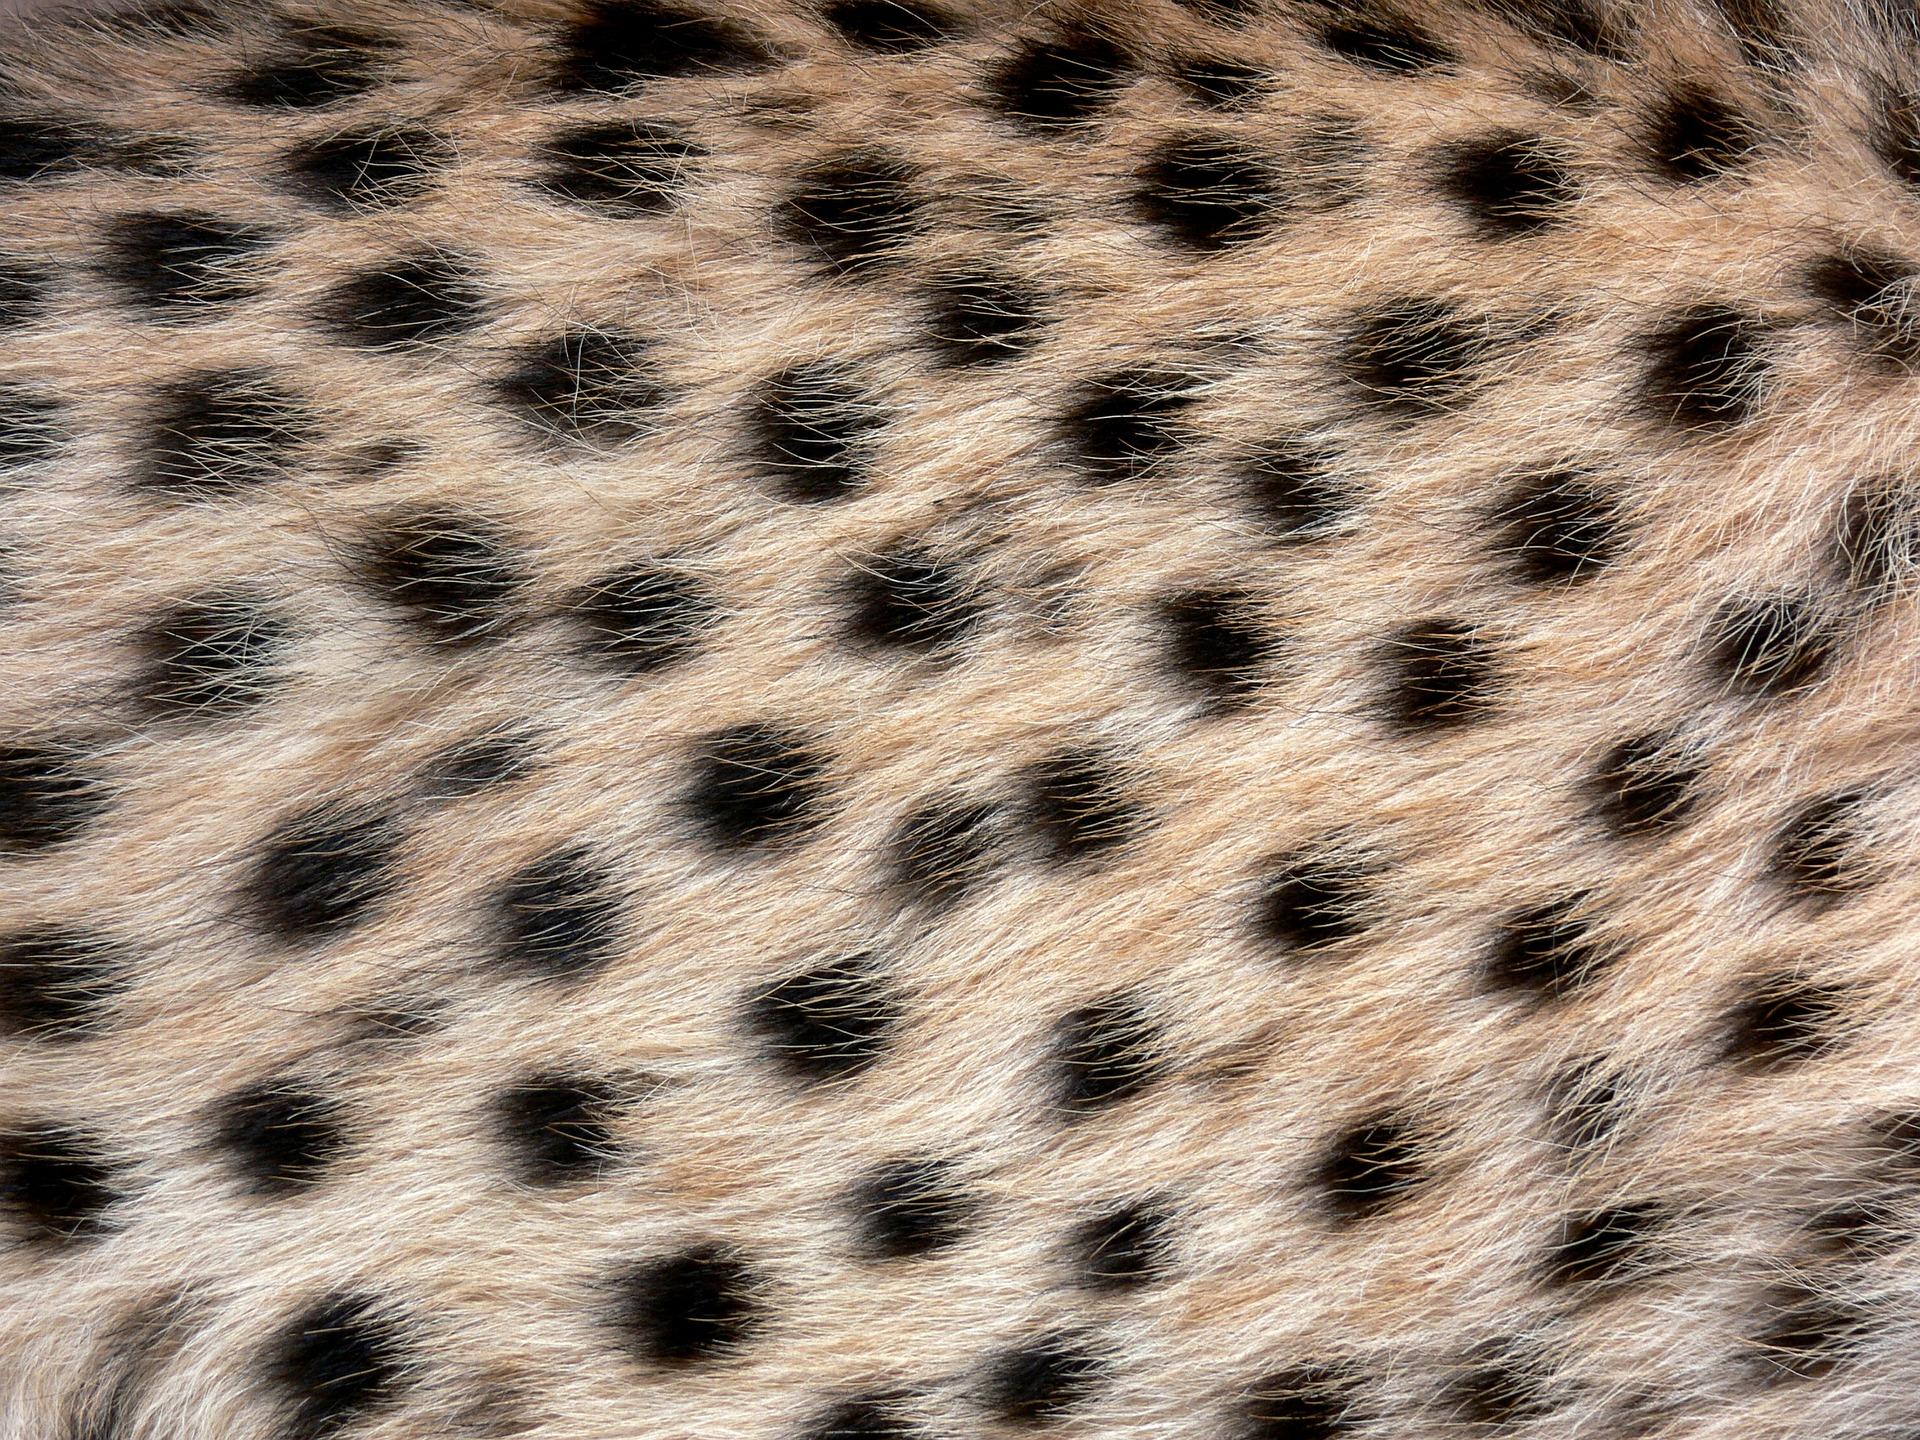 cheetah-275988_1920